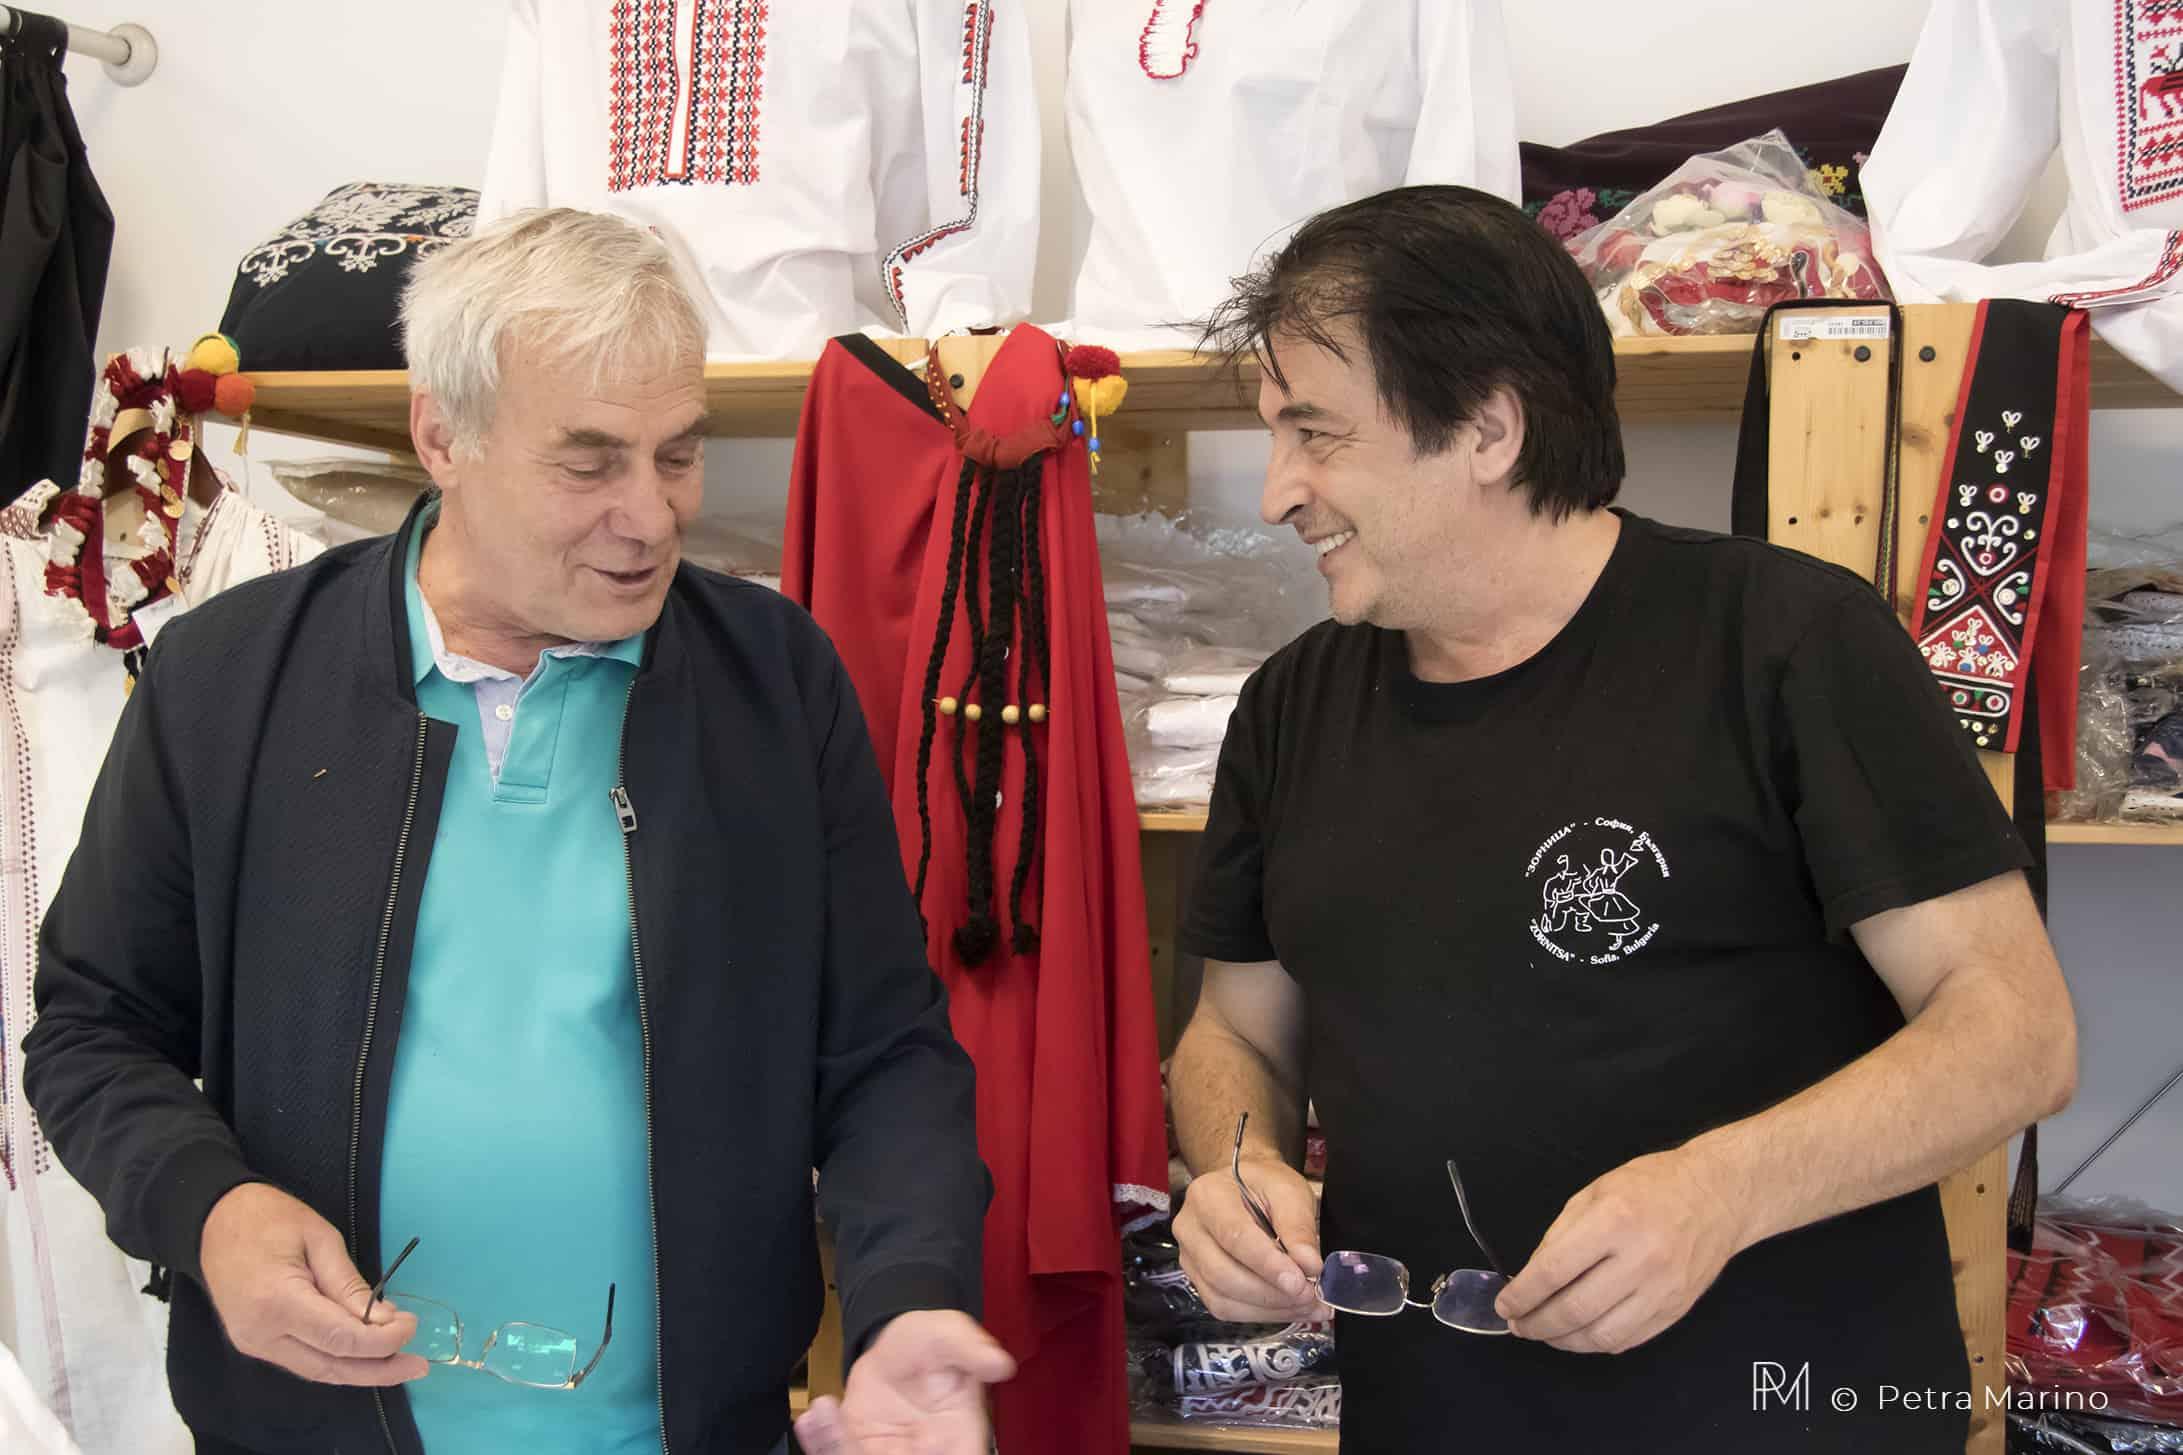 Фолклорни герои - Емил Генов и Борис Димитров - рубрика на Таратанци, част 1